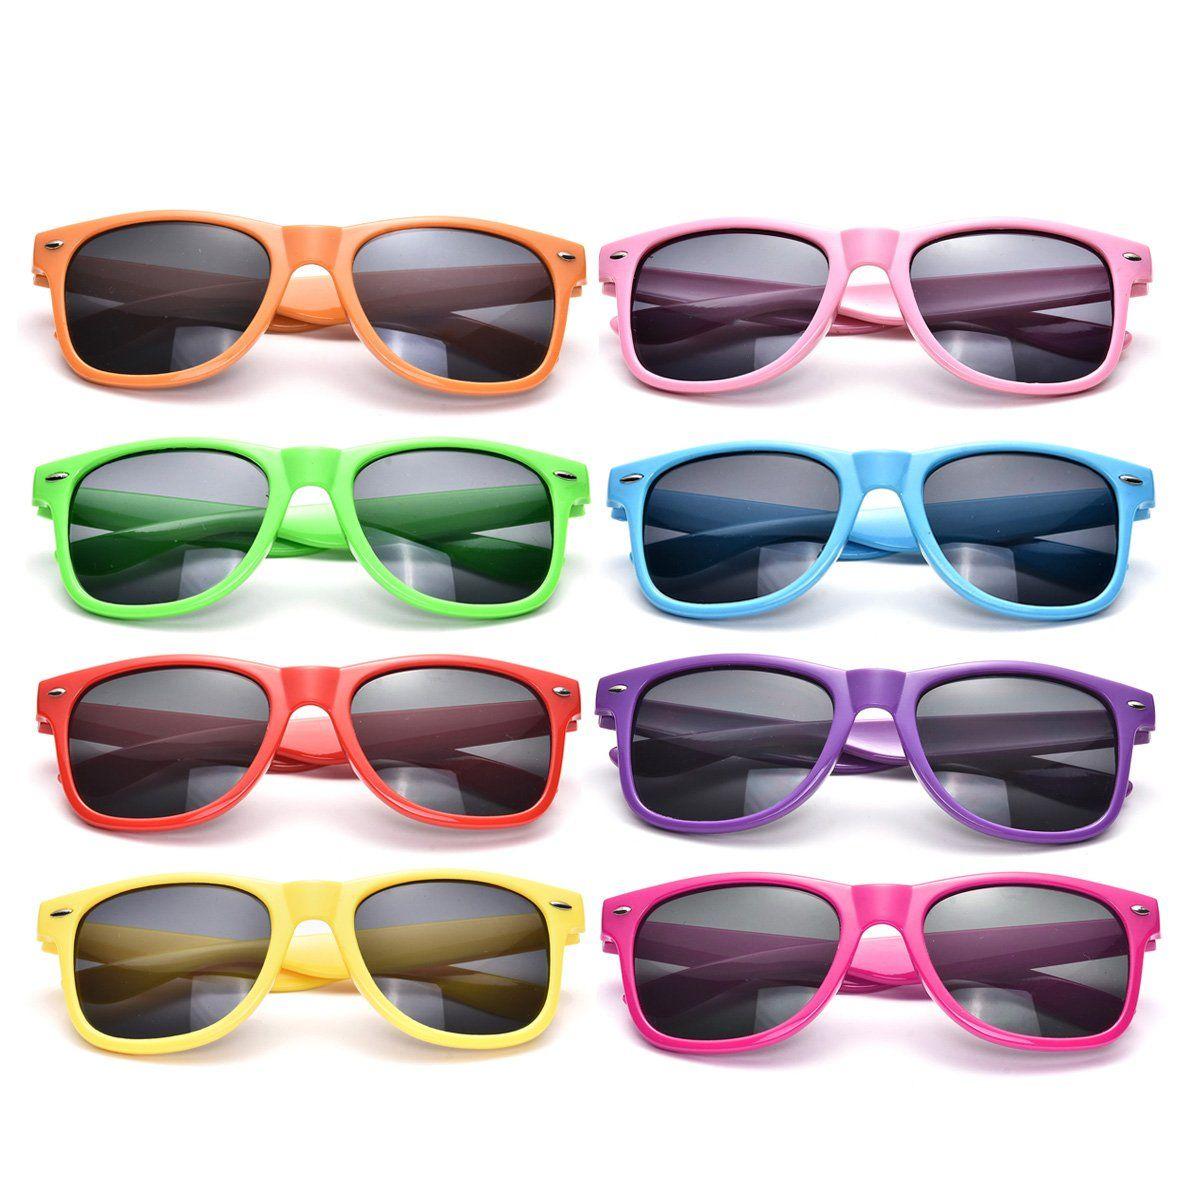 Neon Colors Party Favor Supplies Unisex Sunglasses Pack of